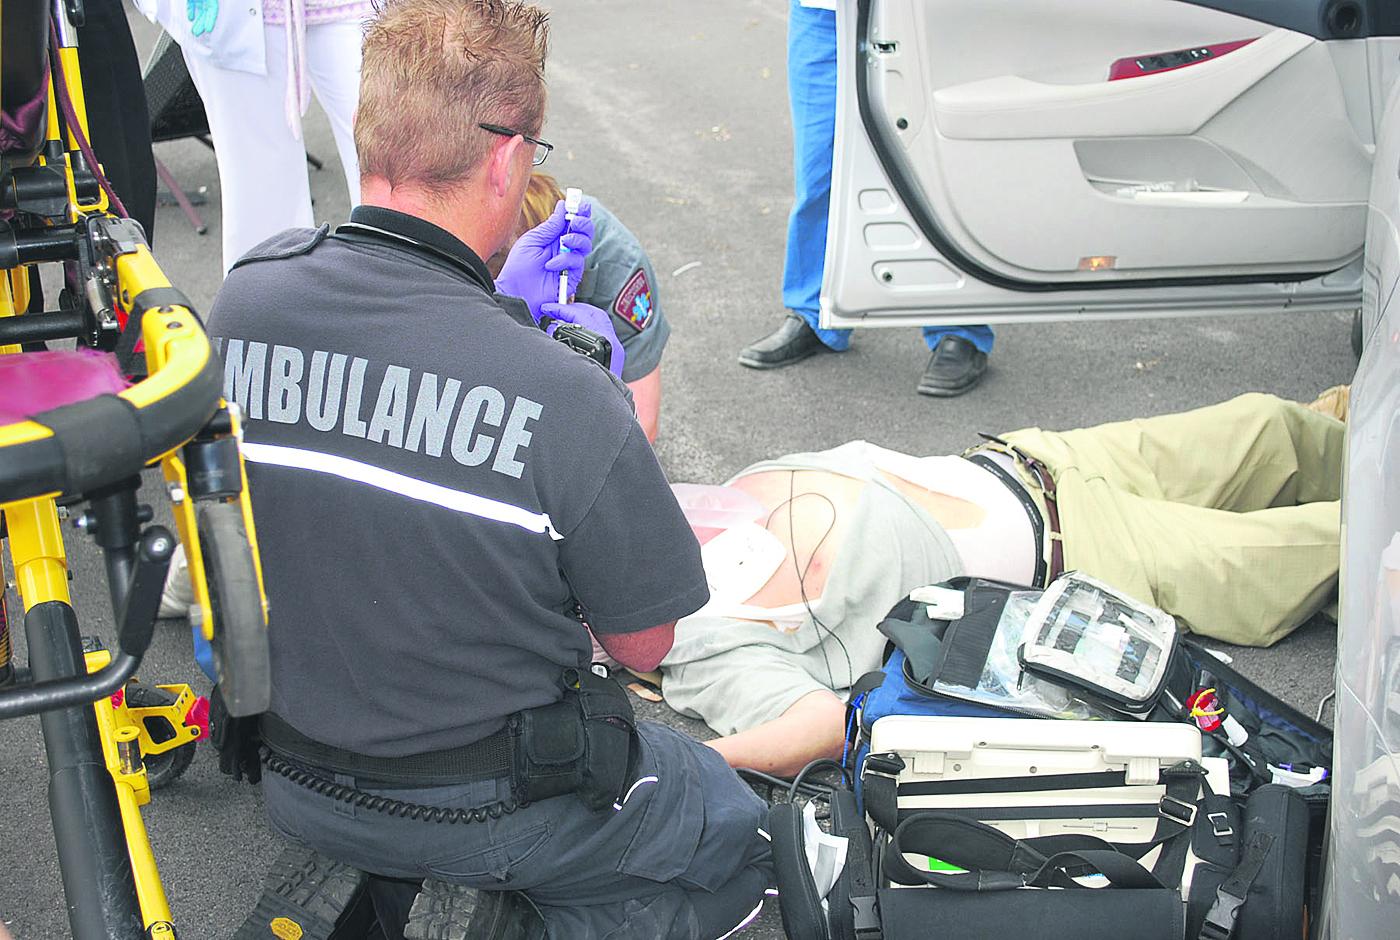 Ambulance ambulancier paramédics